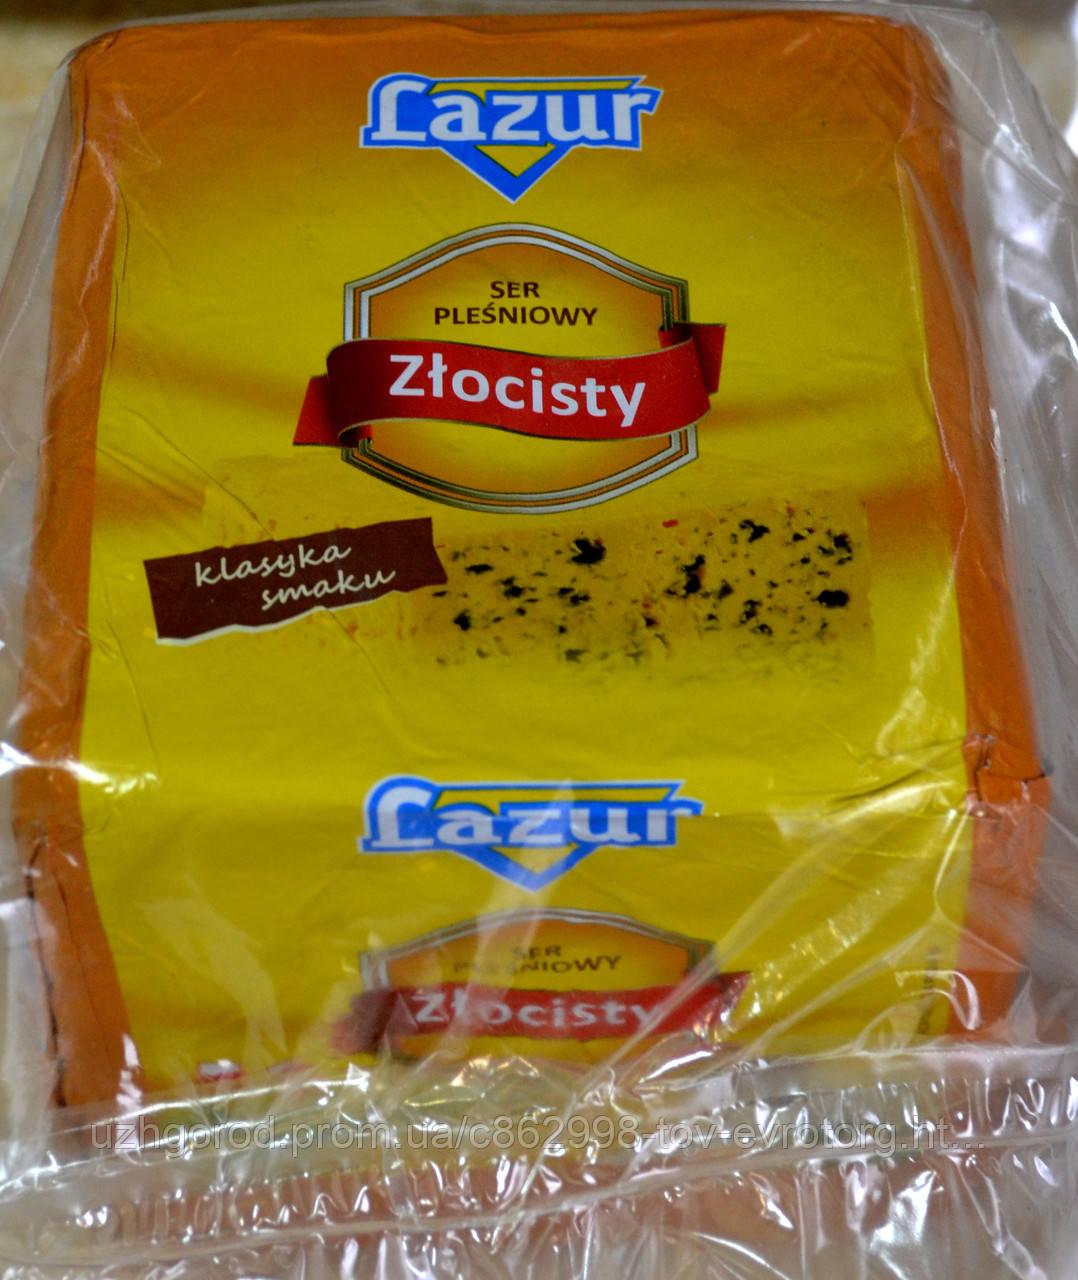 Сыр с плесенью ексклюзивный Lazur Zlocisty  1 кг